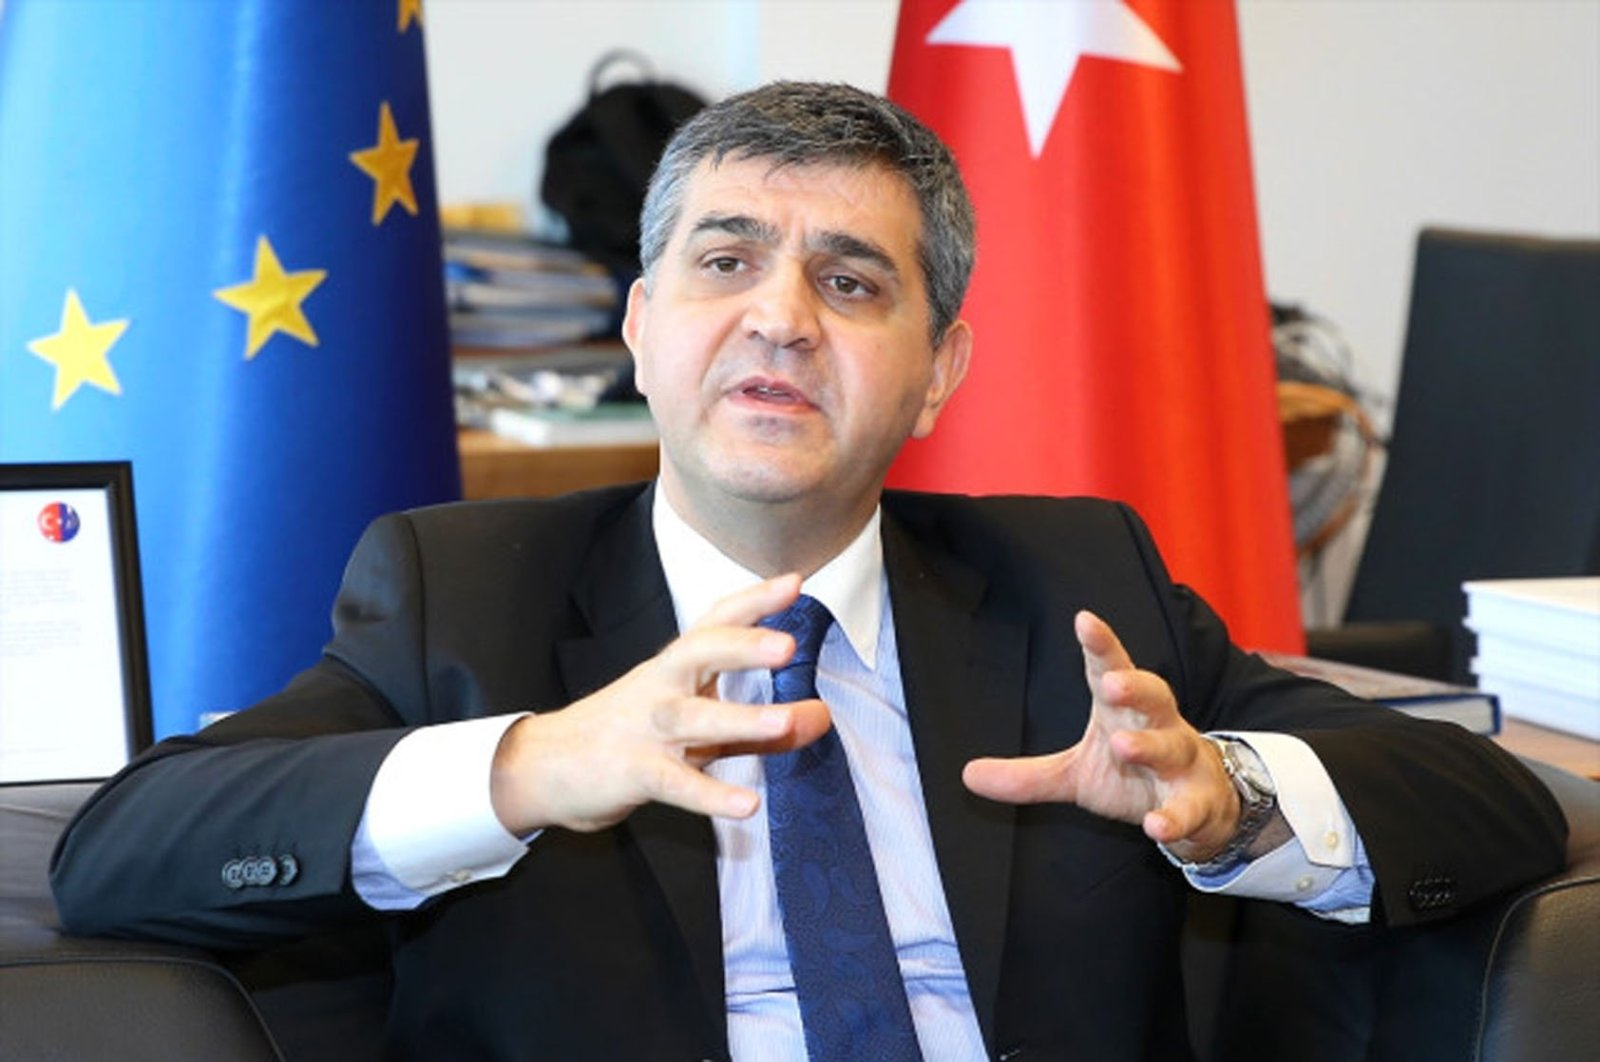 Faruk Kaymakçı, Turkey's deputy foreign minister and director for EU Affairs.